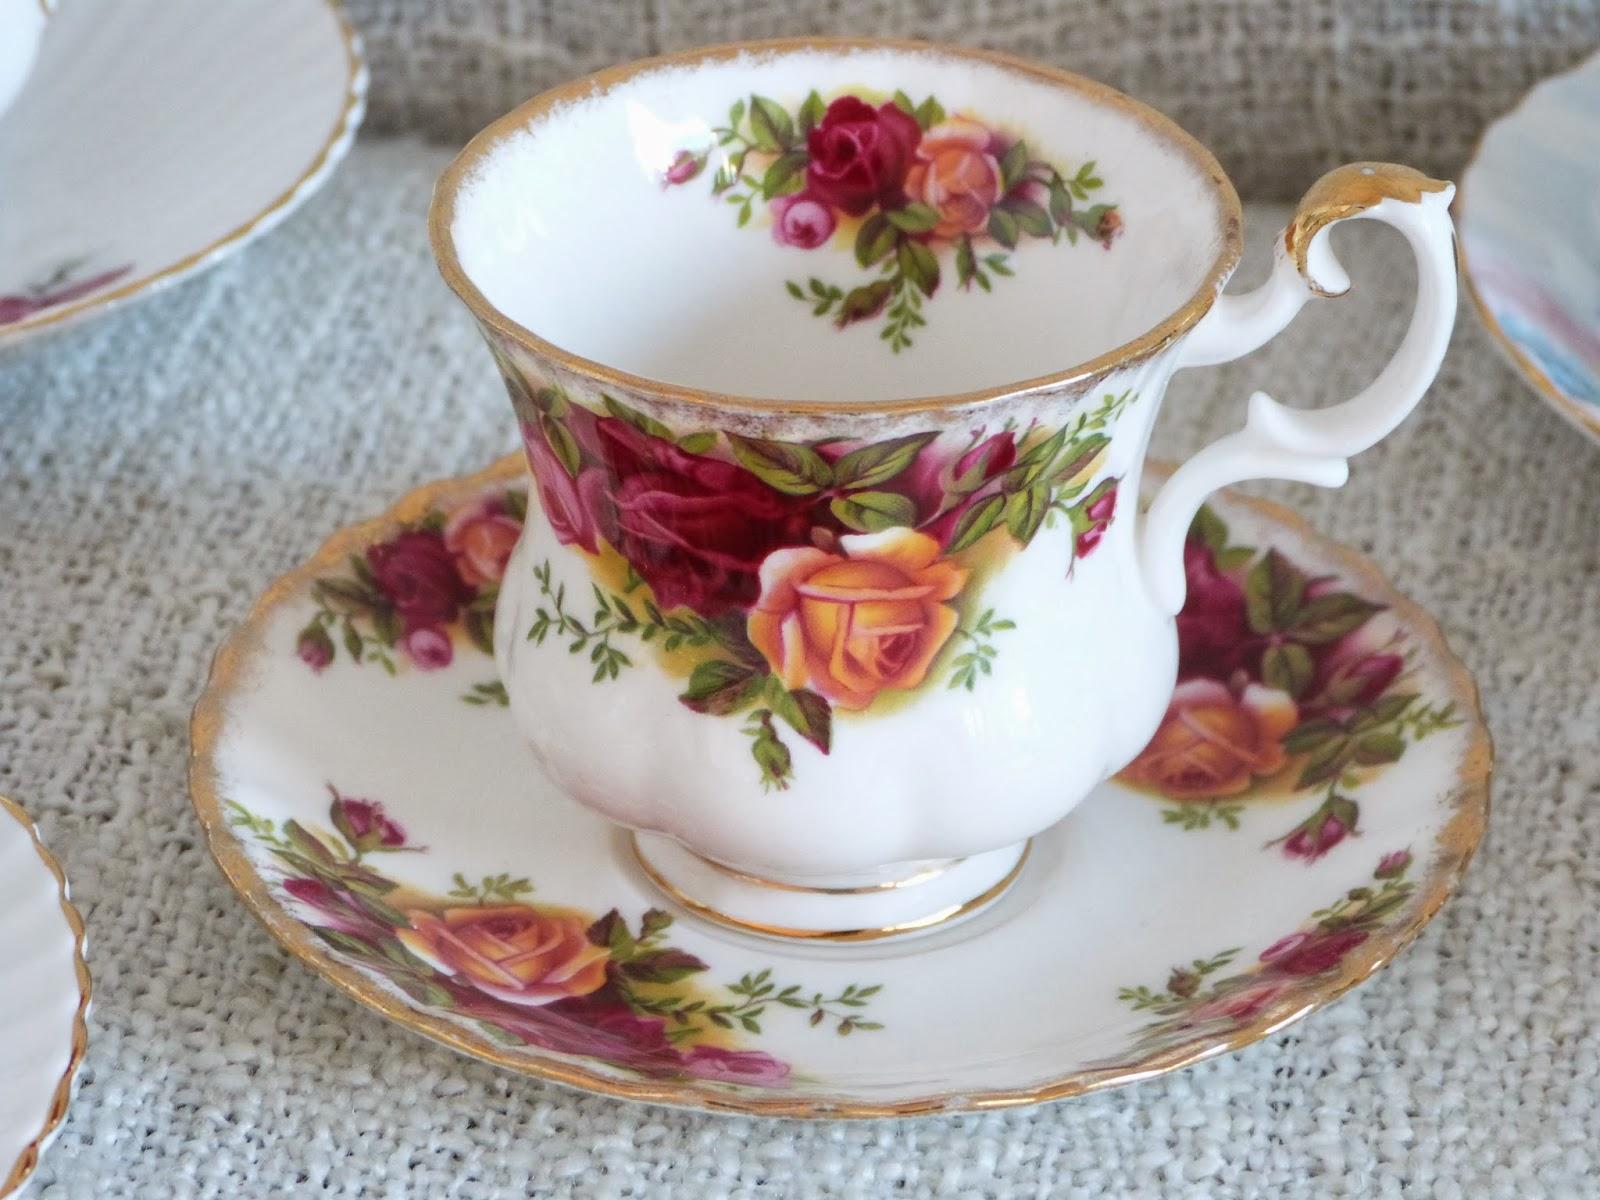 Royal Albert Servies Lavender Rose.Bone China Royal Albert Lavender Rose